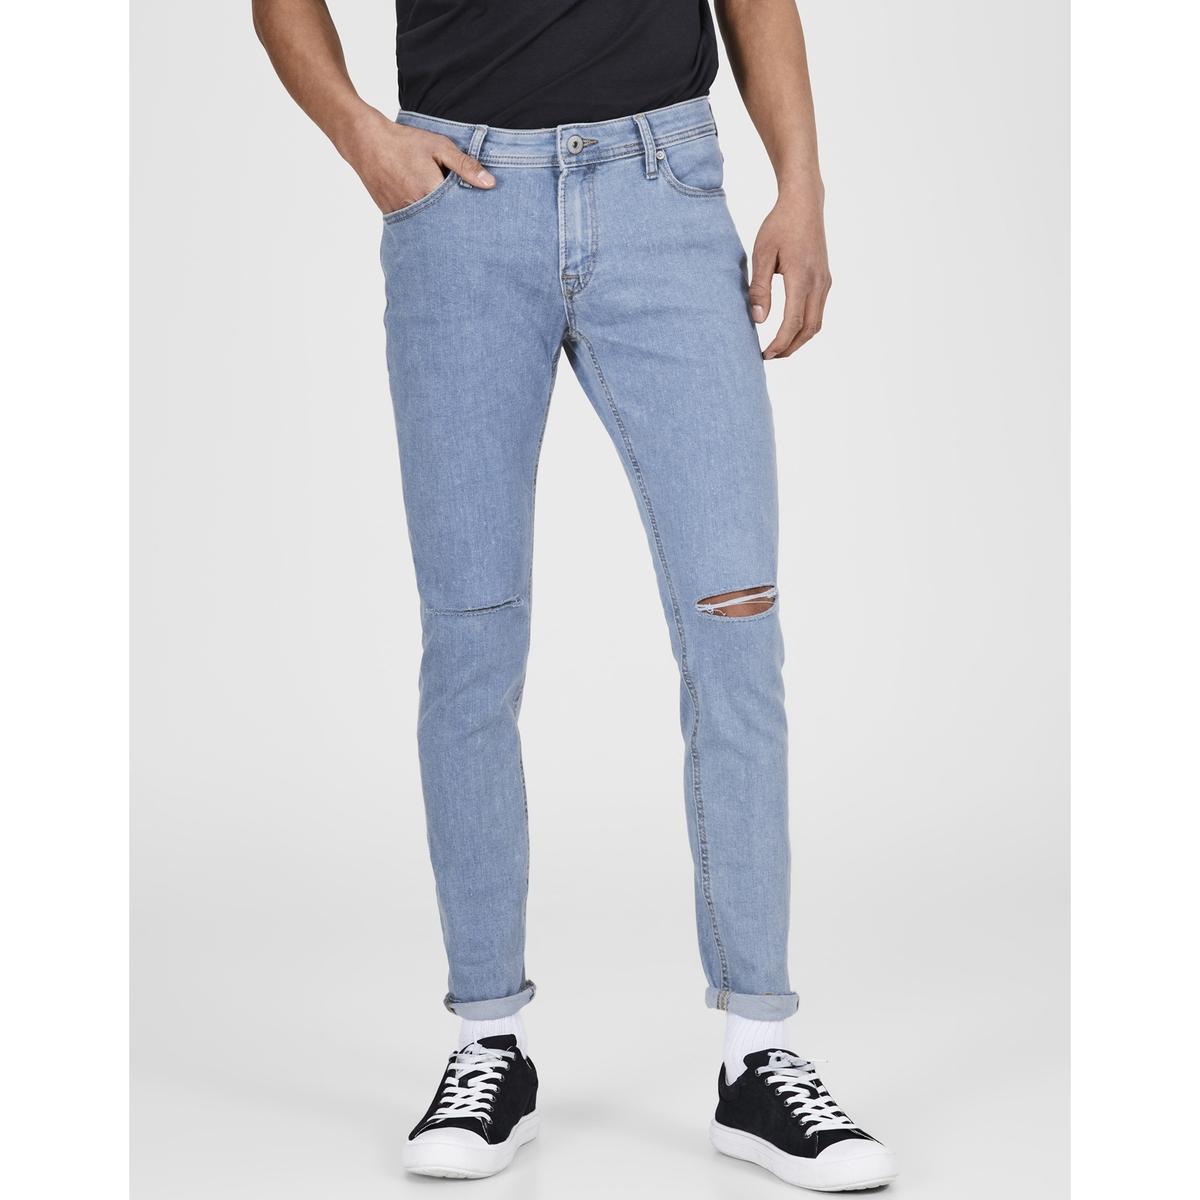 Jeans skinny, Jjiliam Jjoriginal